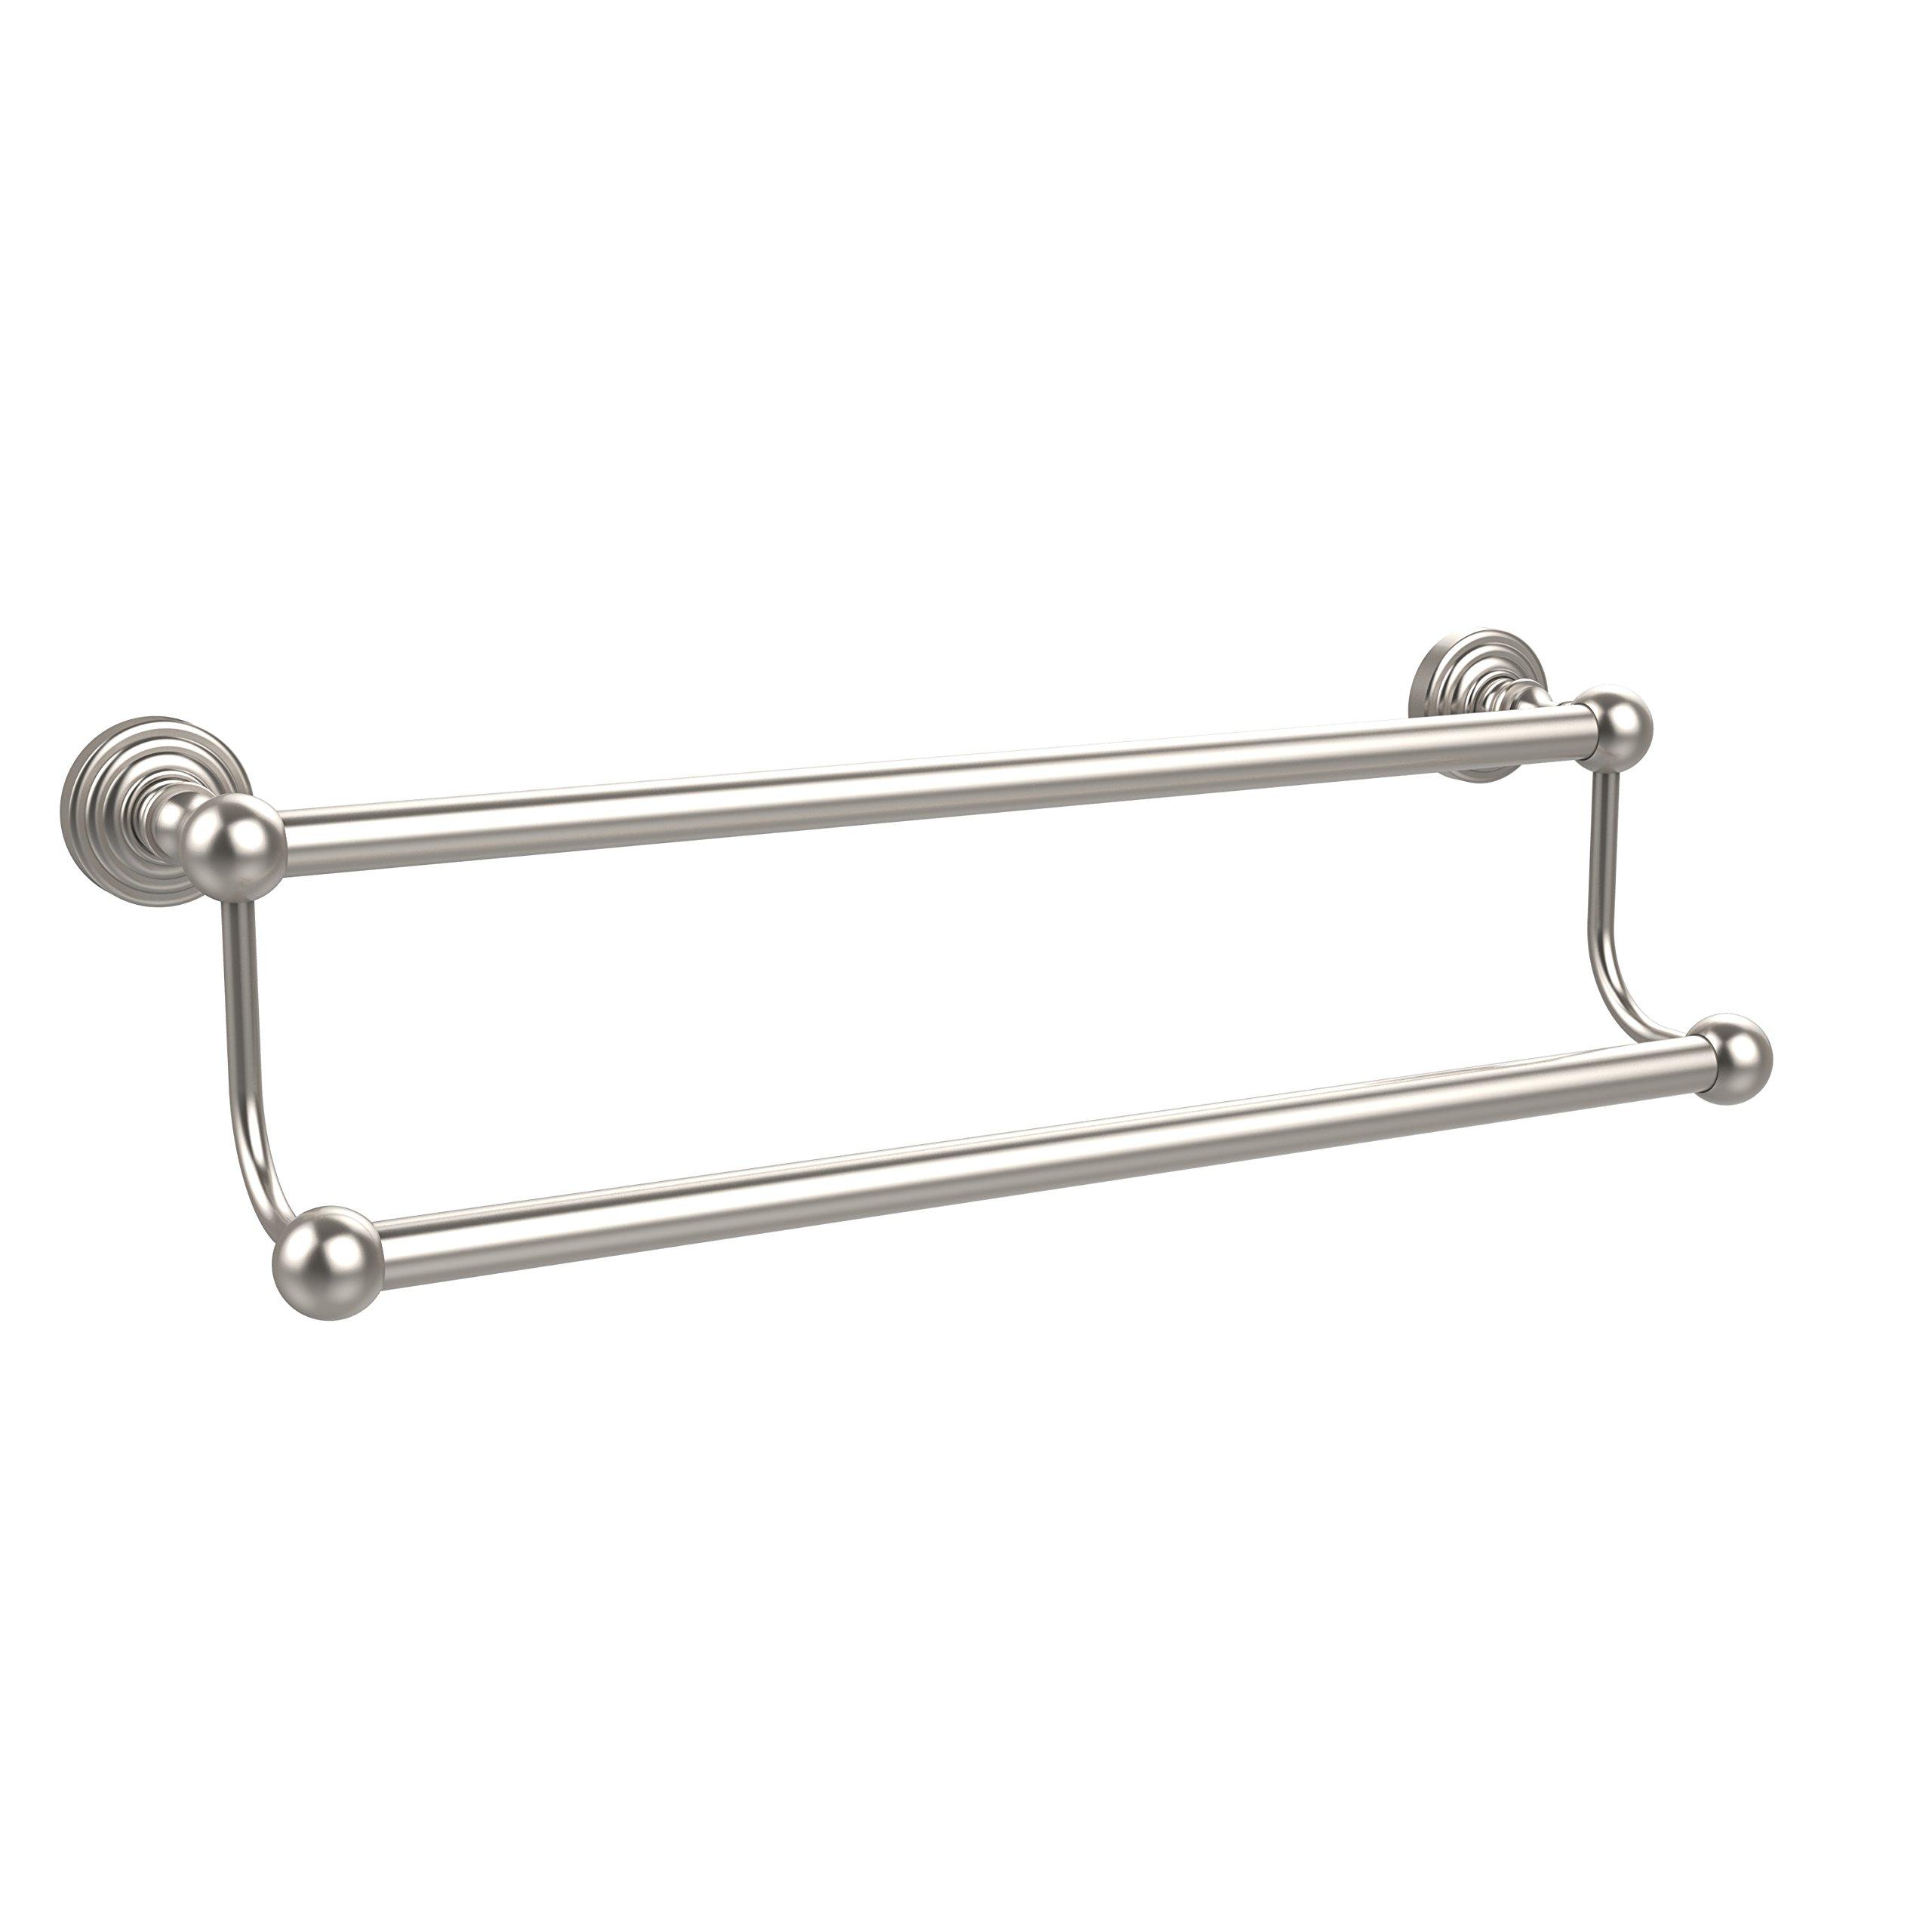 Allied Brass 18'' Double Towel Bar Satin Nickel